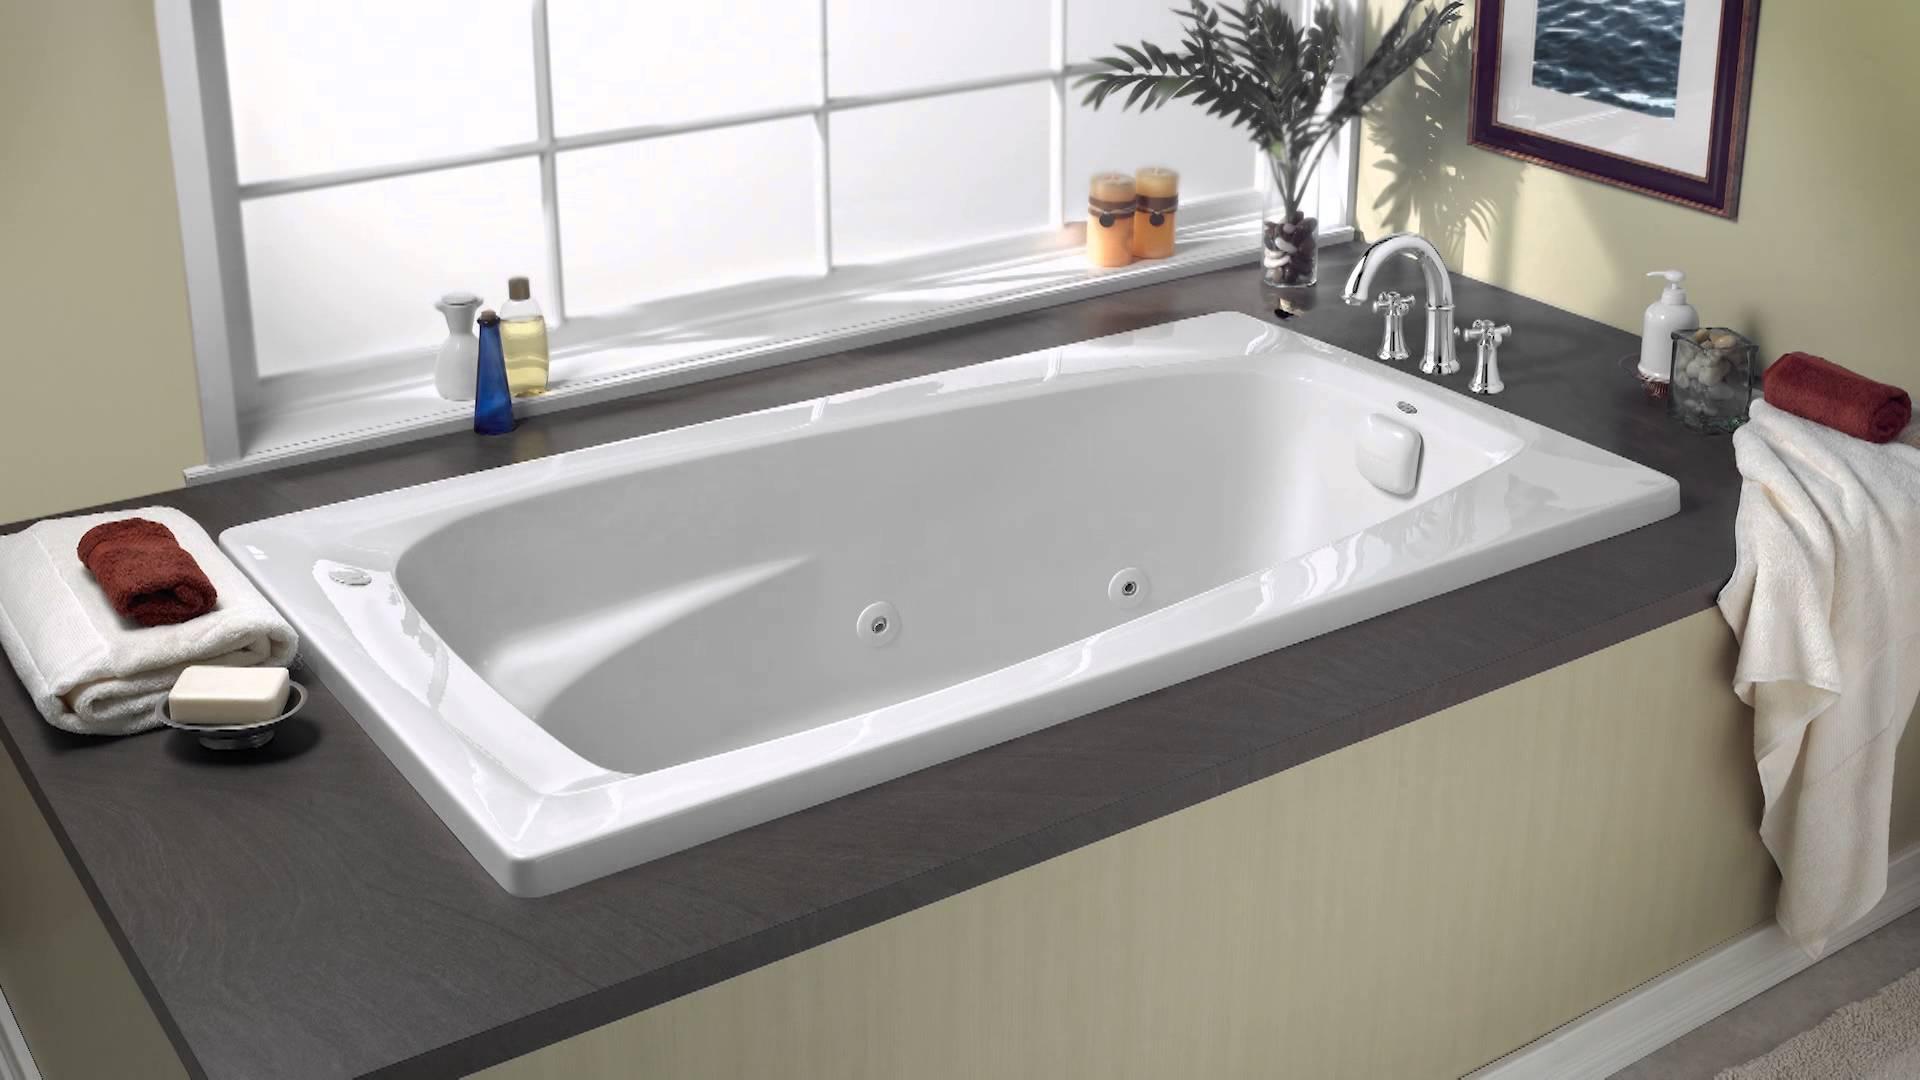 Install/Replace Bathtub